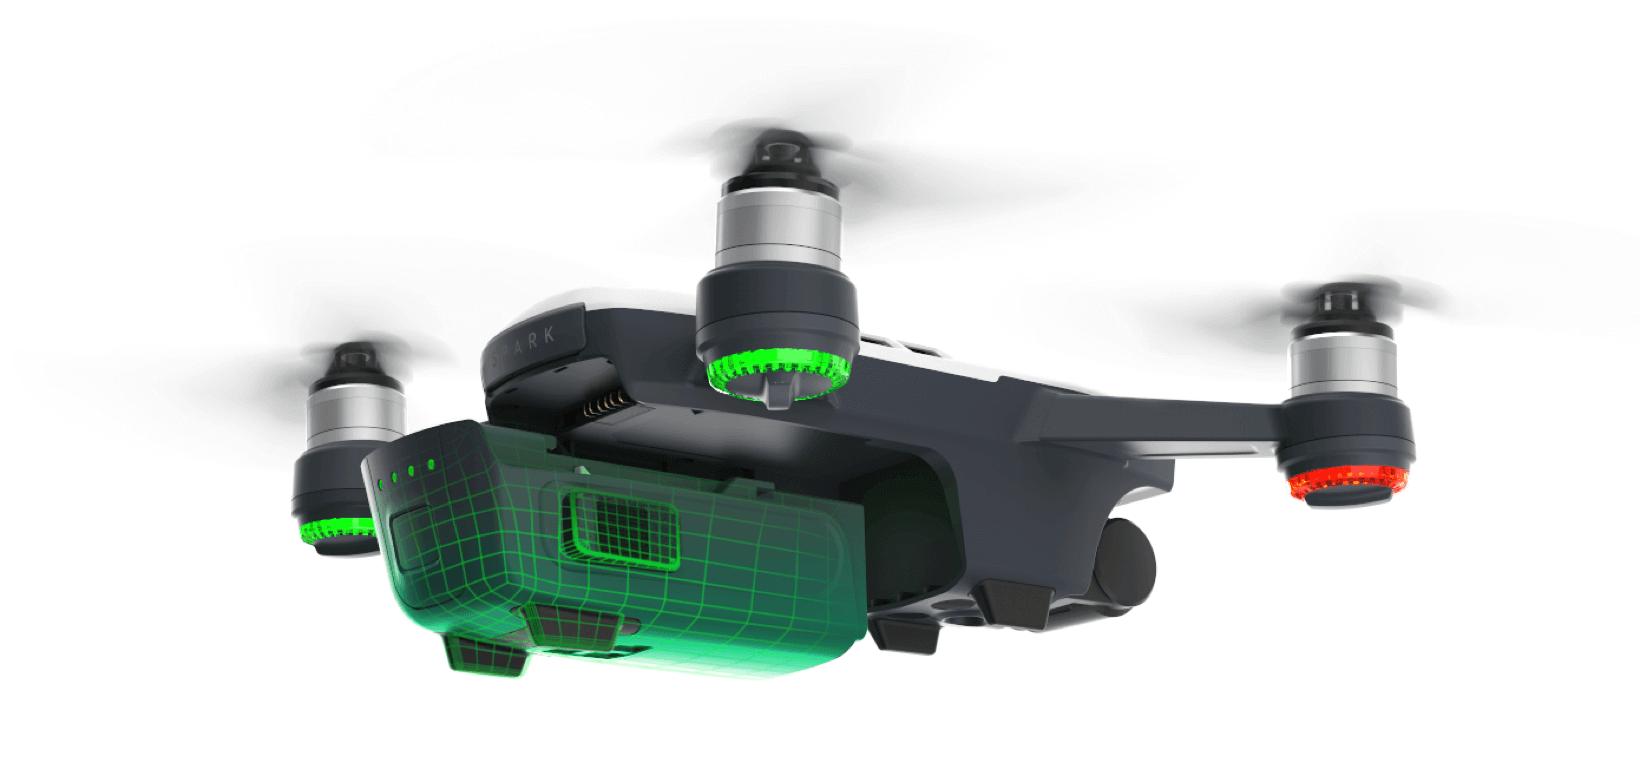 Dji Spark Selfie Drone Sky Blue Uncompromised Flight Time